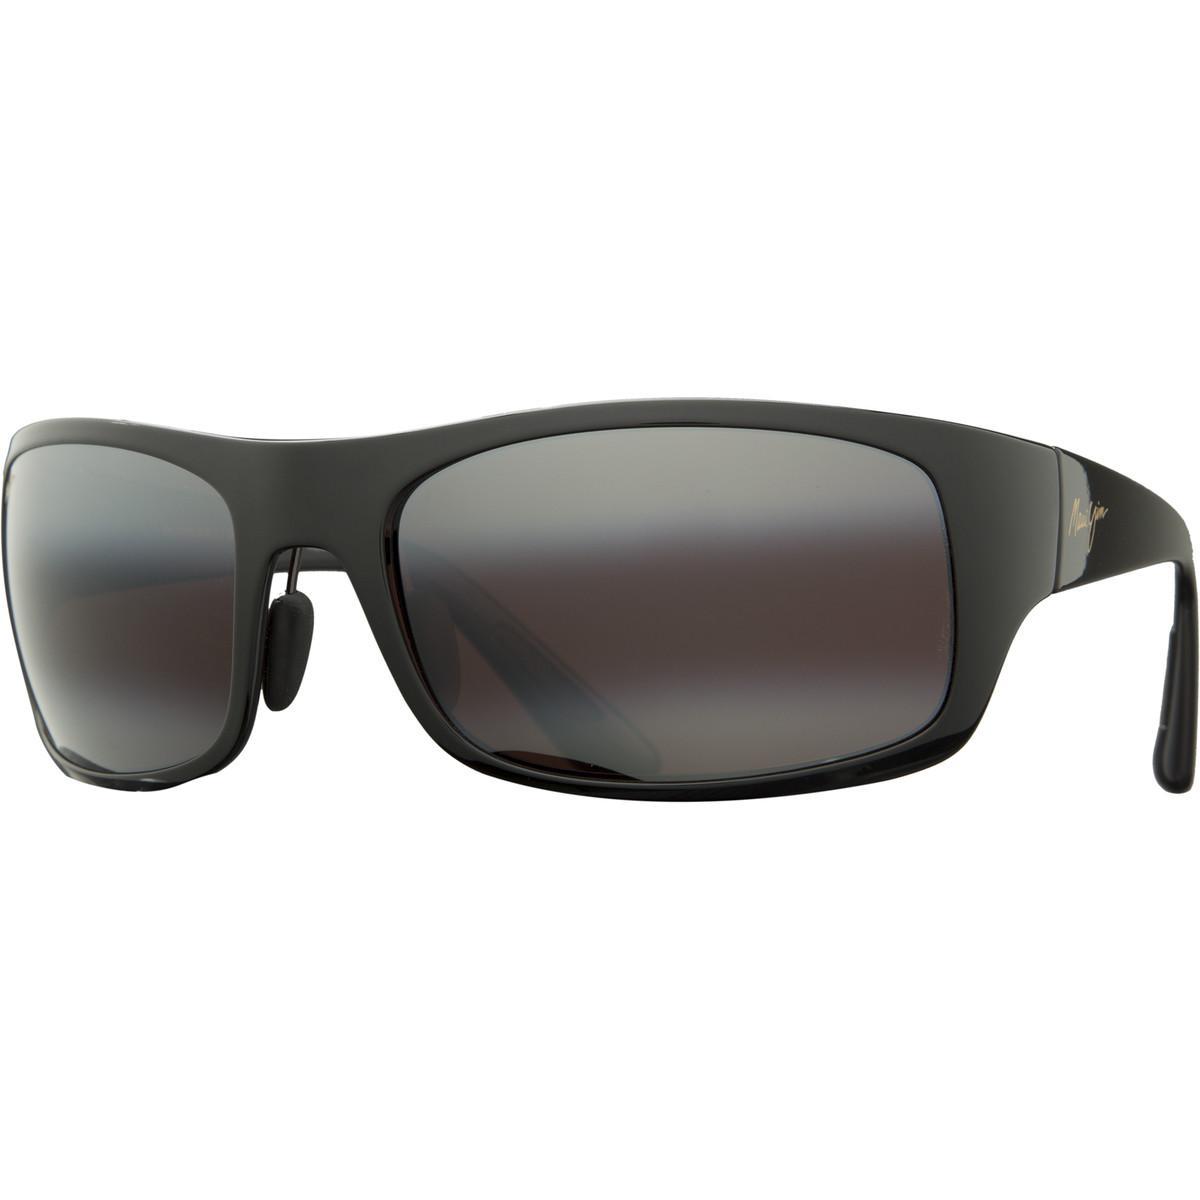 2911e9dc80 Lyst - Maui Jim Haleakala Sunglasses - Polarized in Black for Men